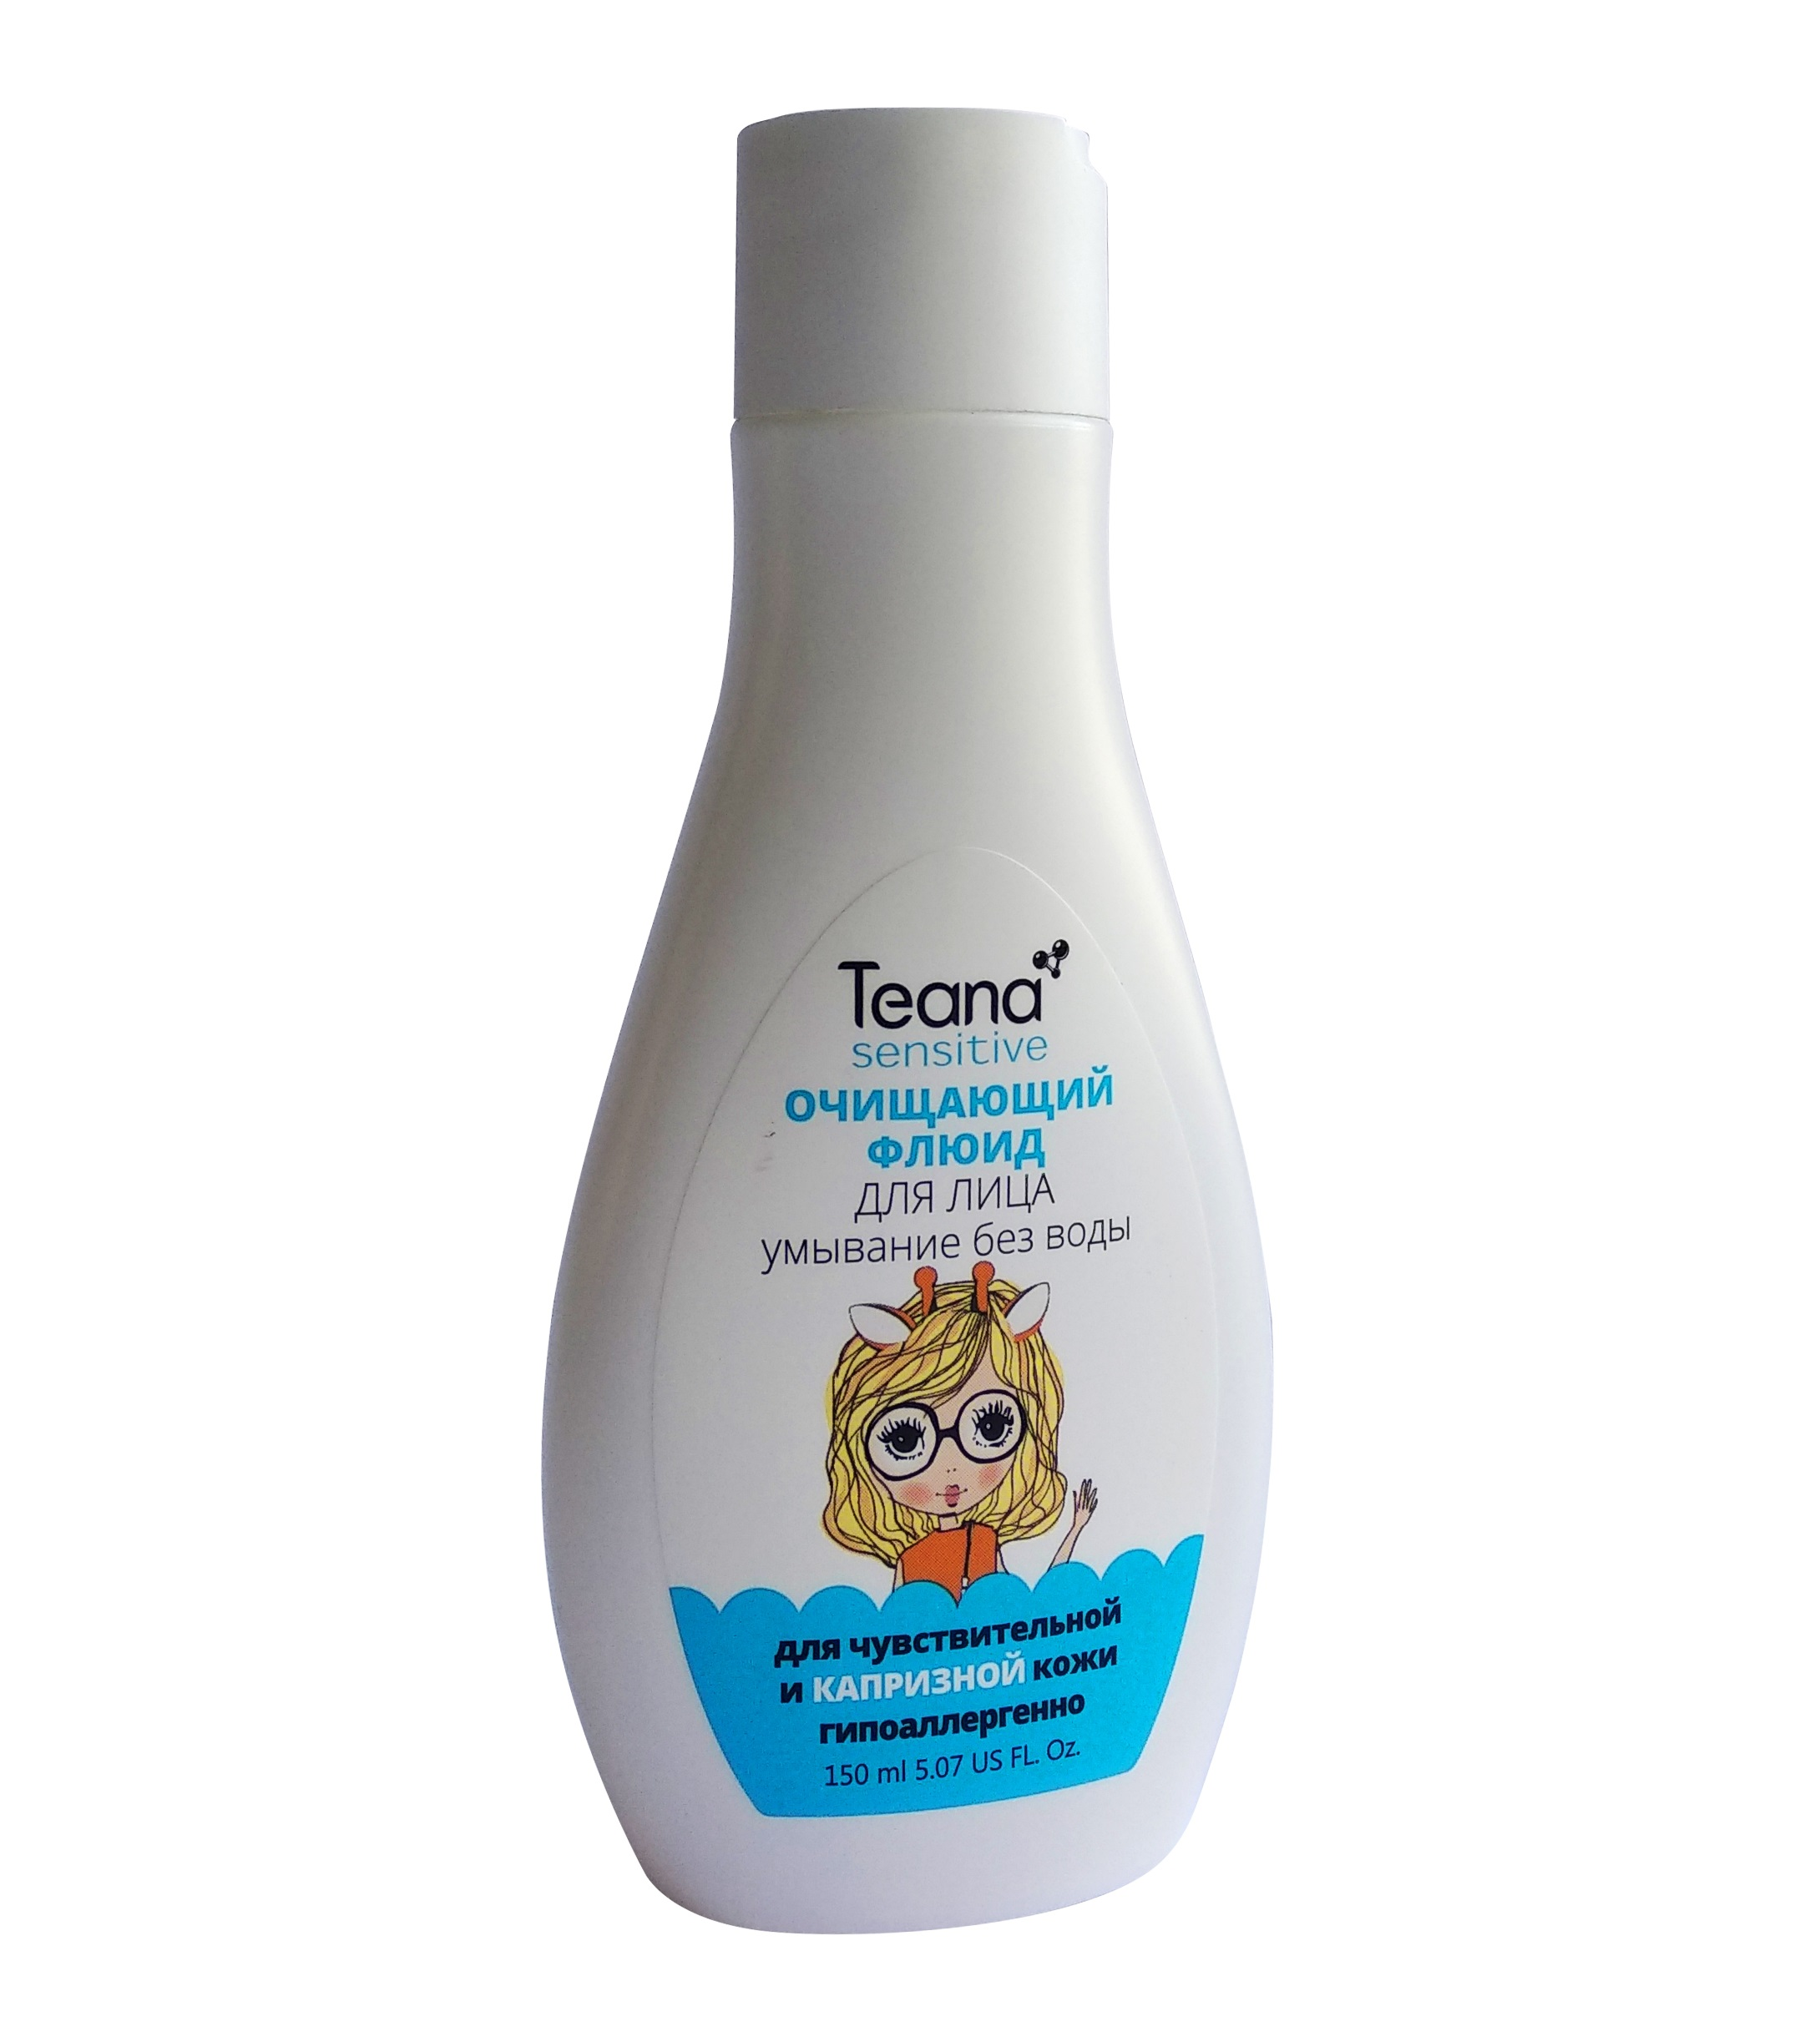 TEANA Флюид очищающий для лица и шеи / Sensitive 150 мл фото